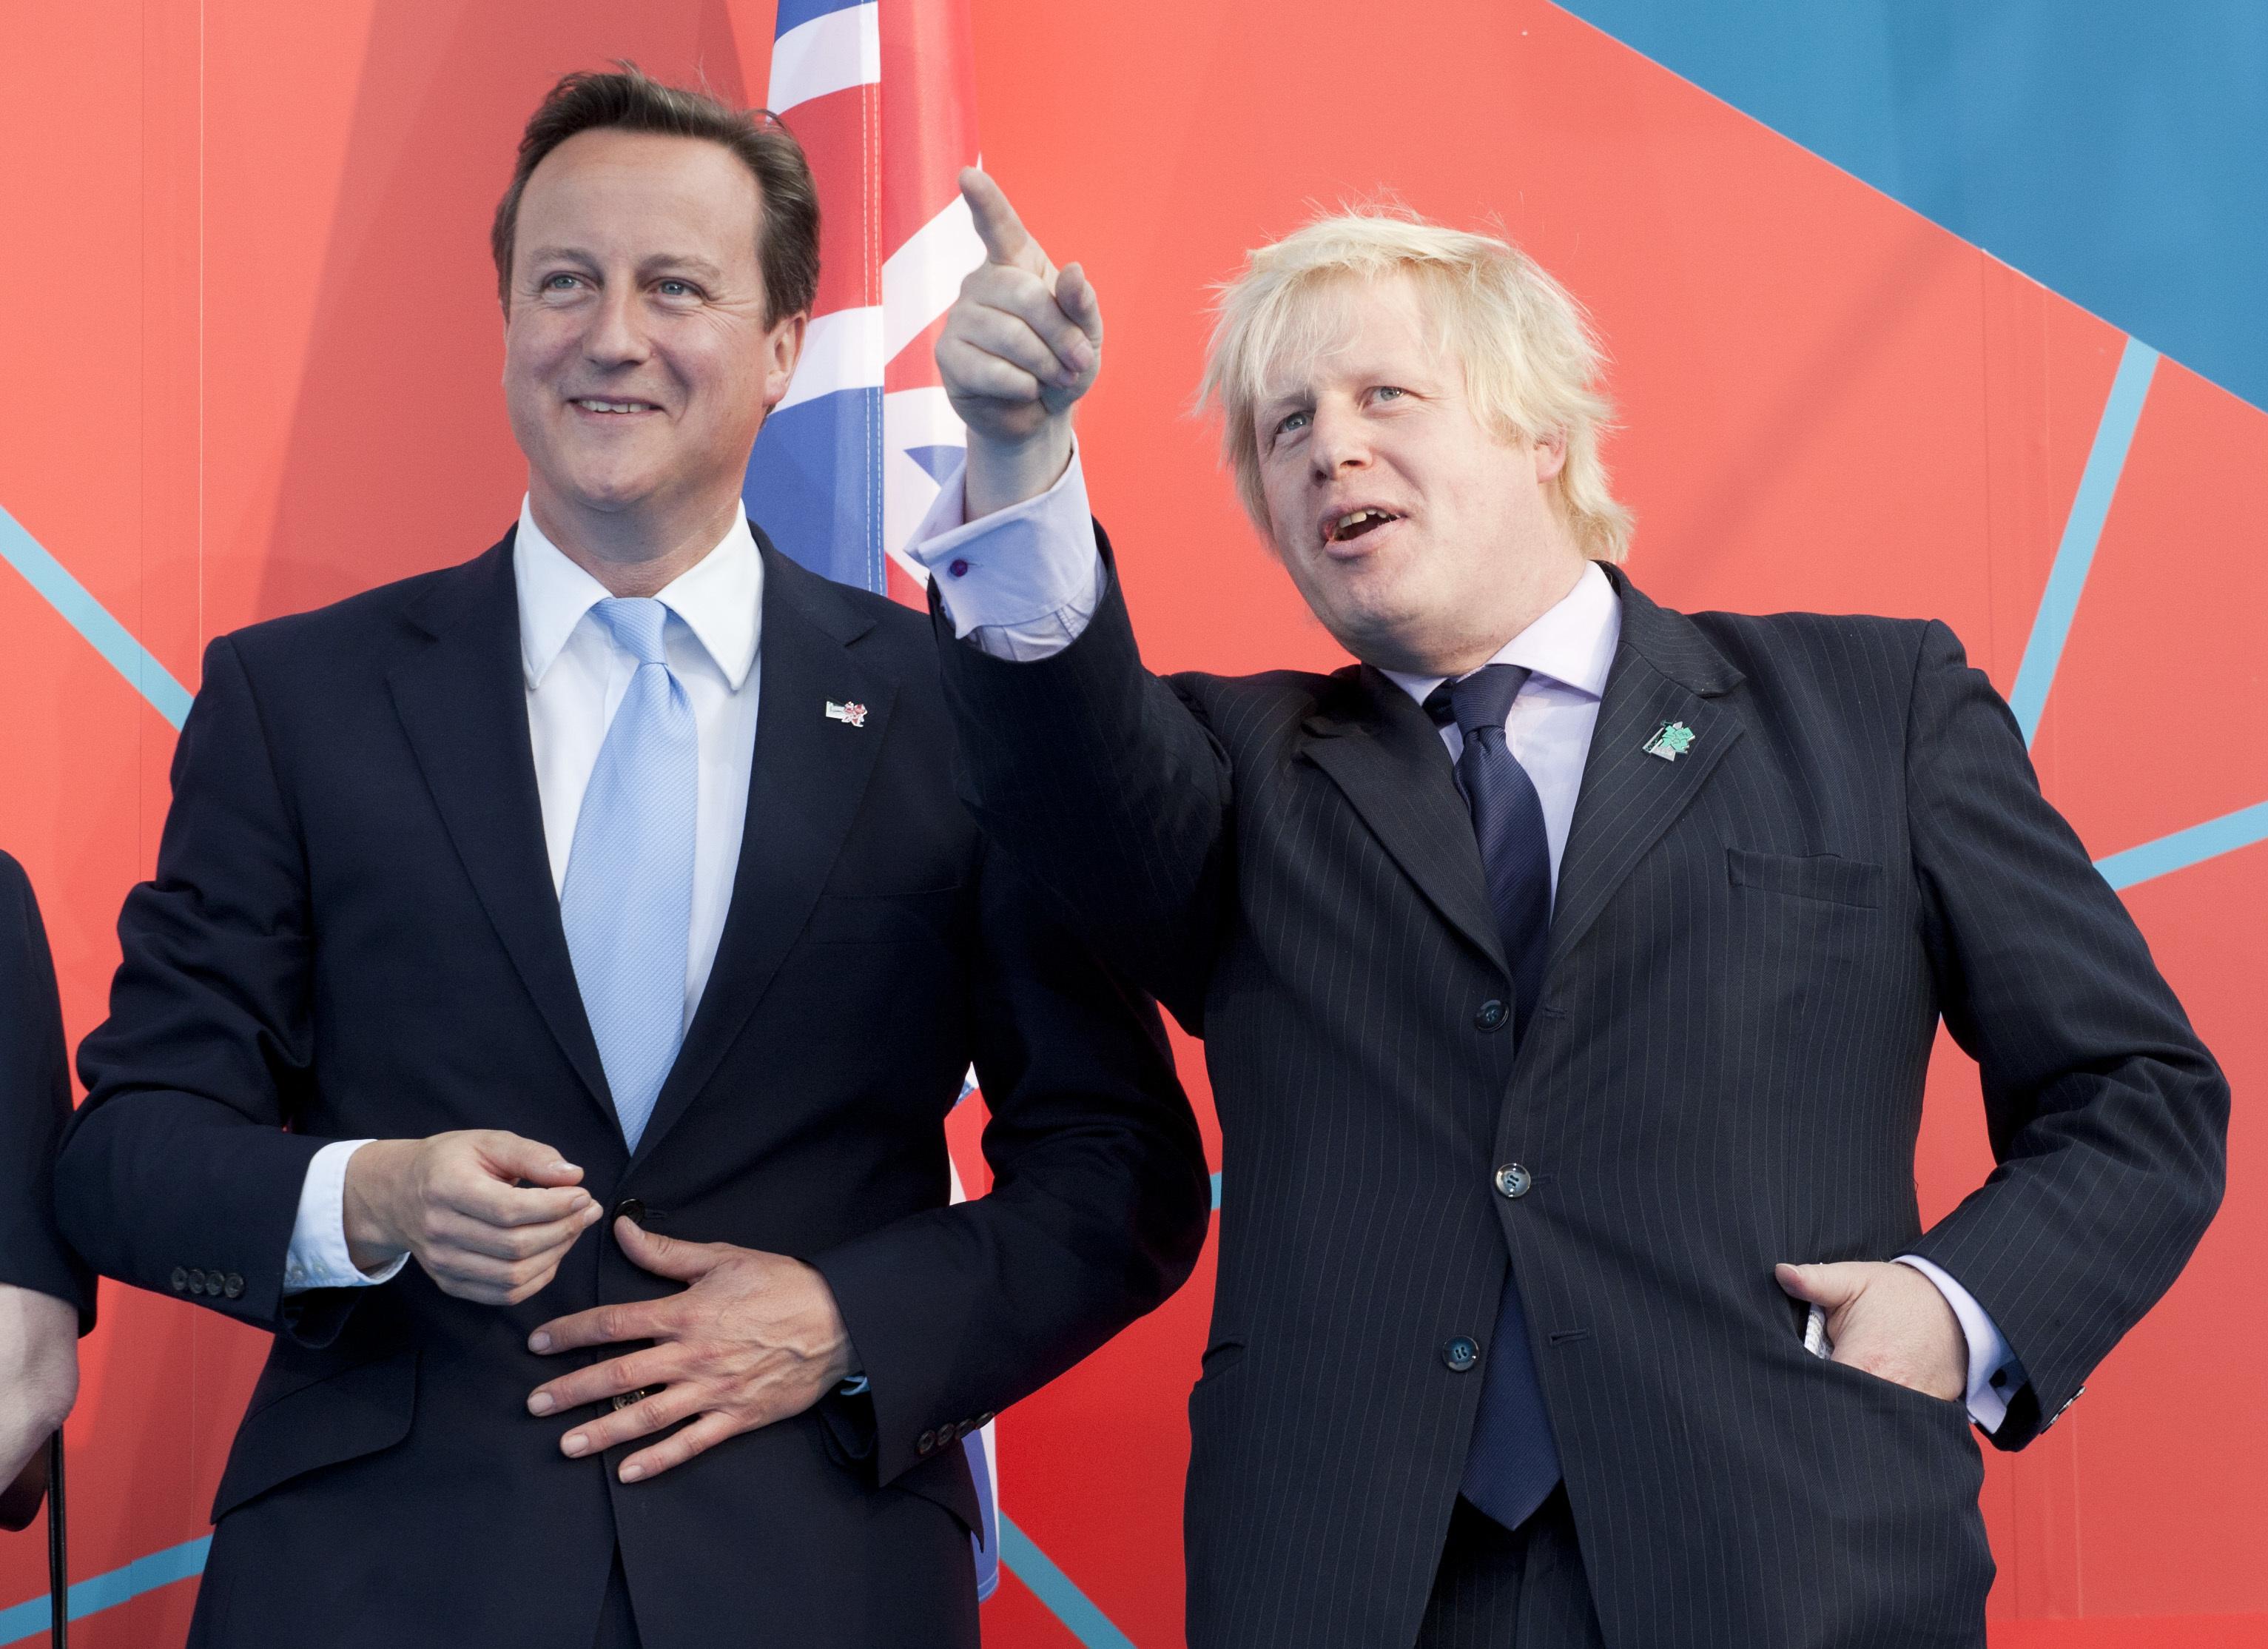 David Cameron and Boris Johnson during the' London 2012 One Year To Go' ceremony in Trafalgar Square. London